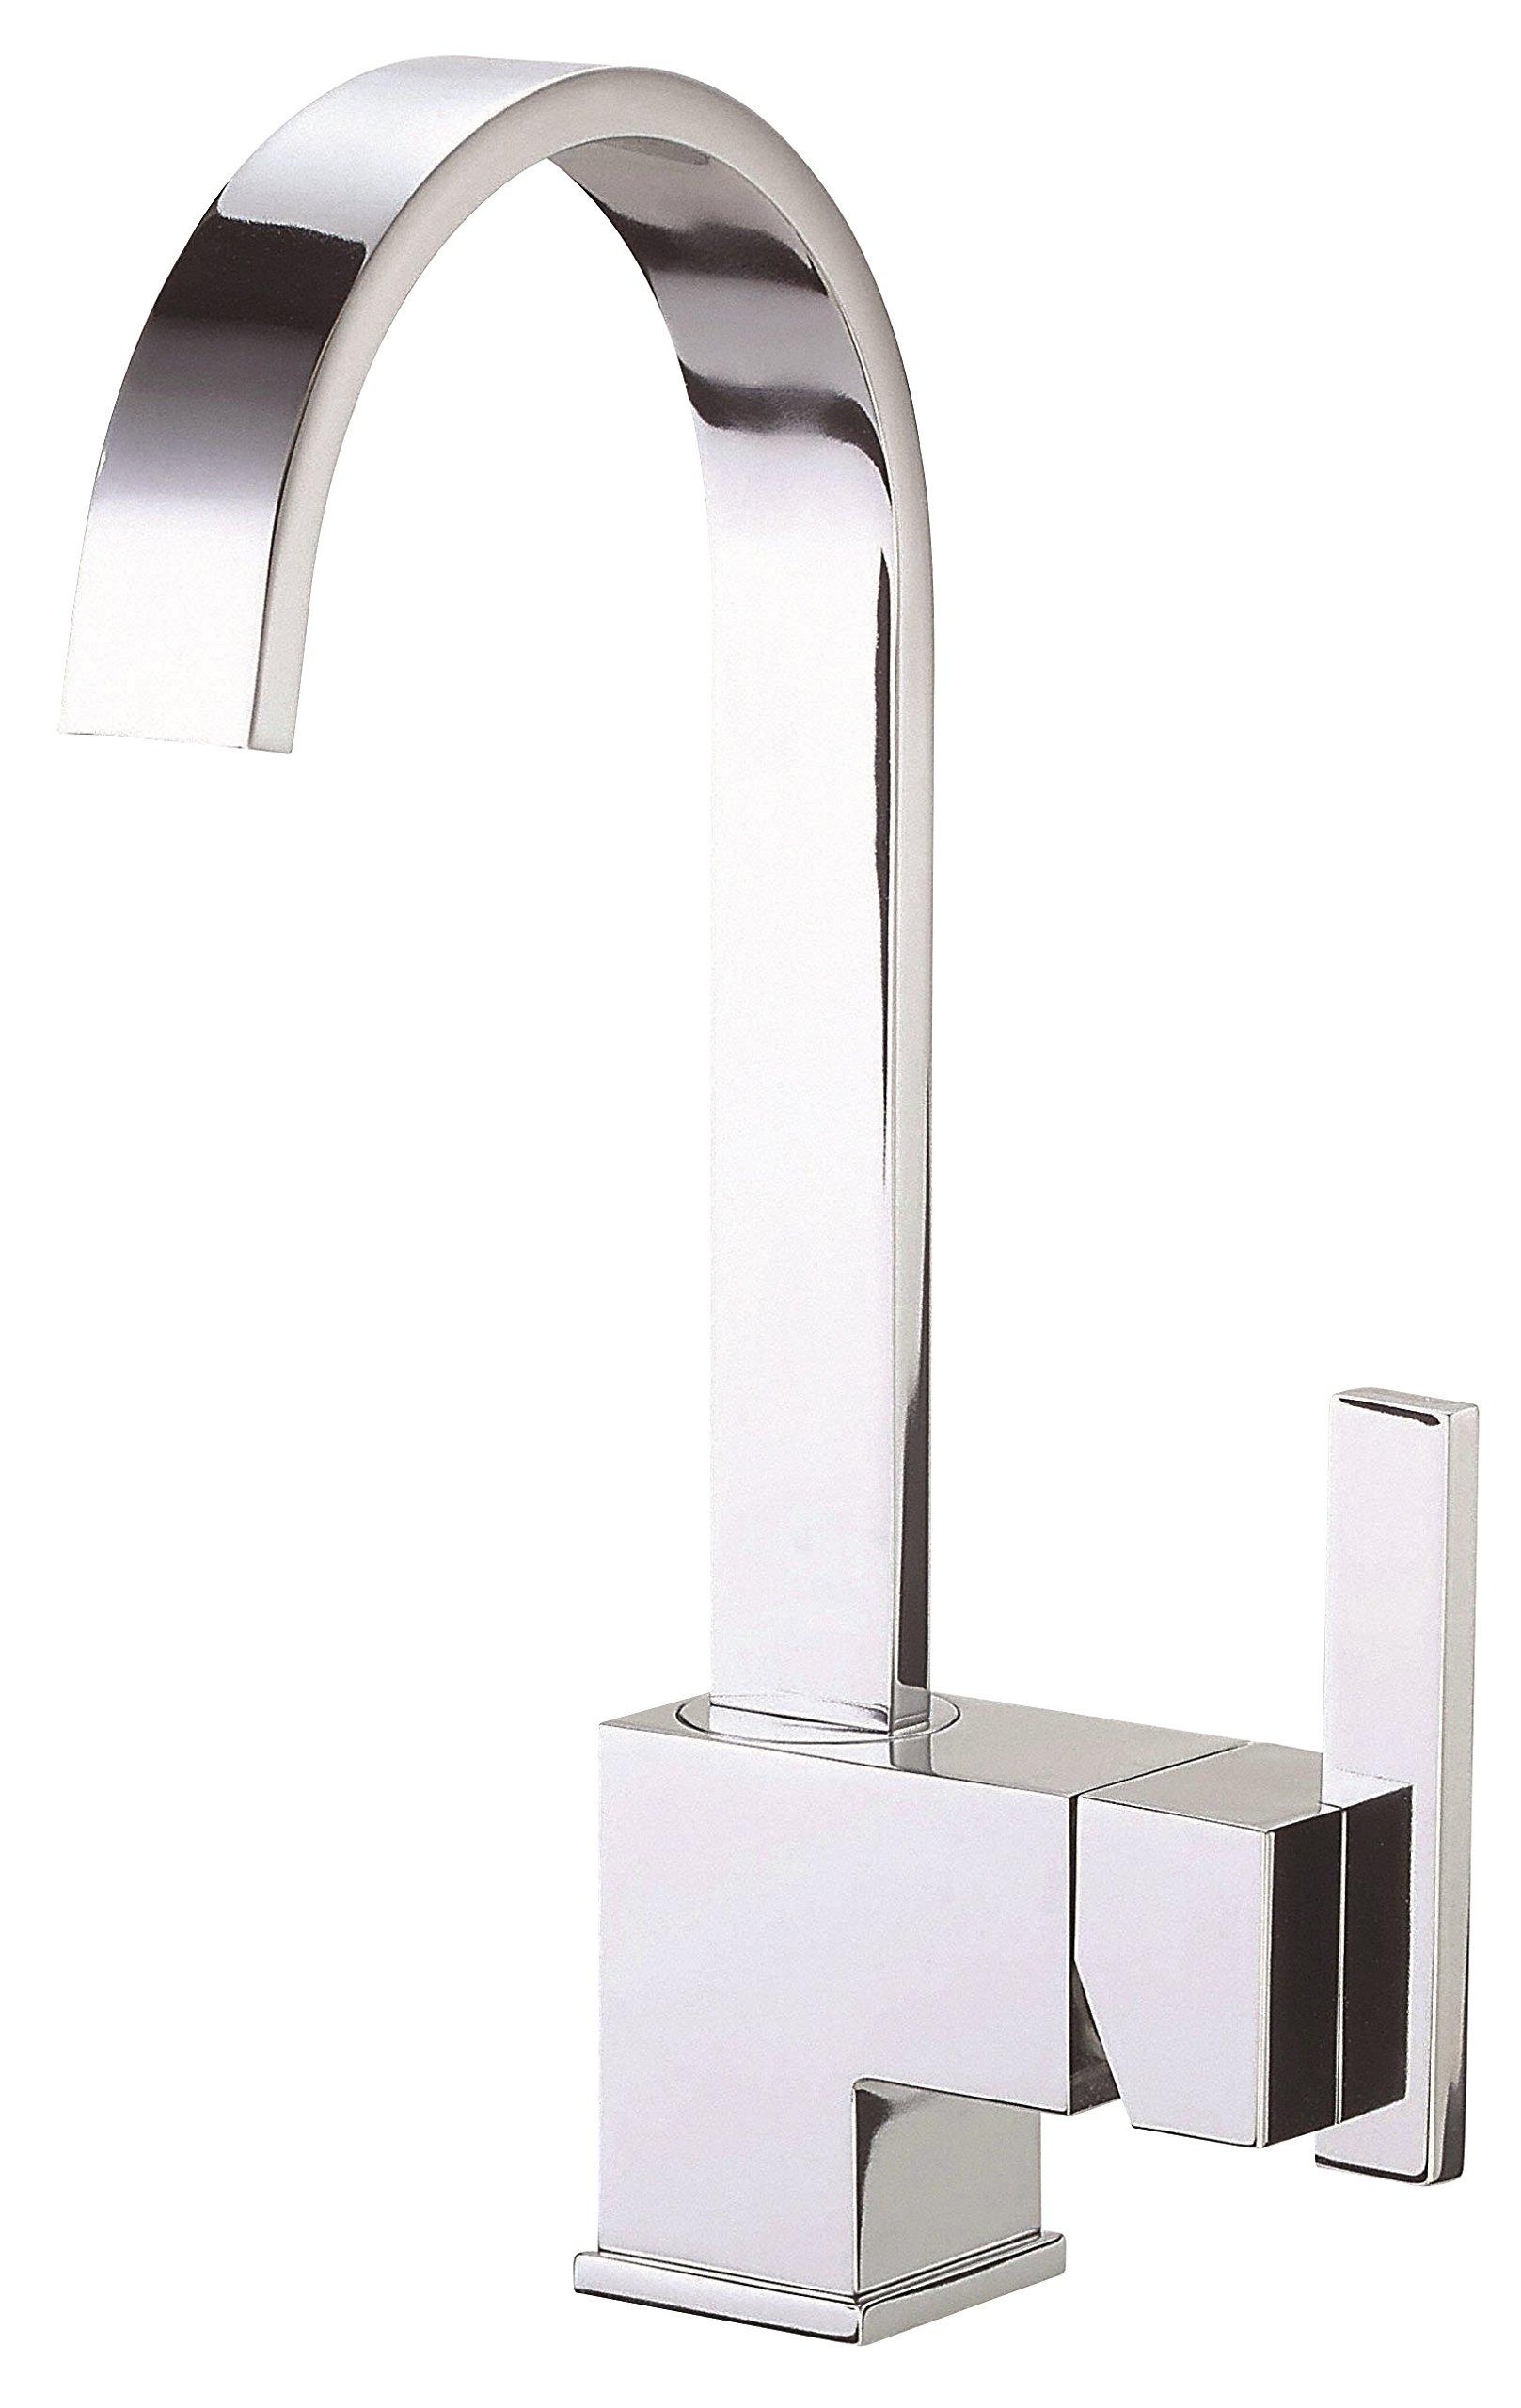 Danze D150644 Sirius Single Handle Bar Faucet, Chrome